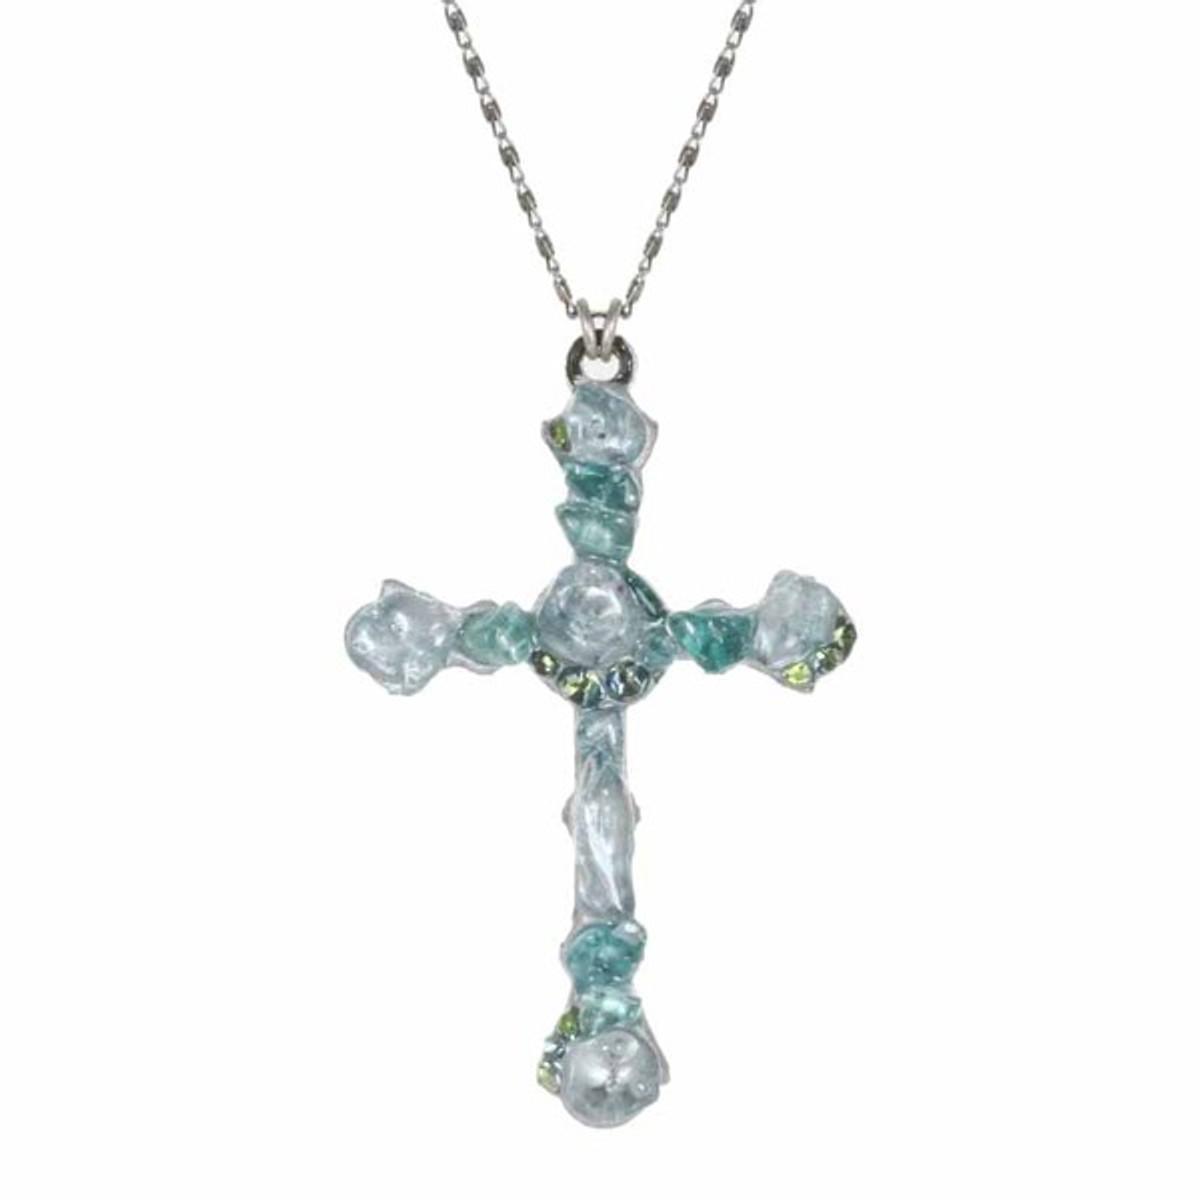 Large Aqua Cross Necklace